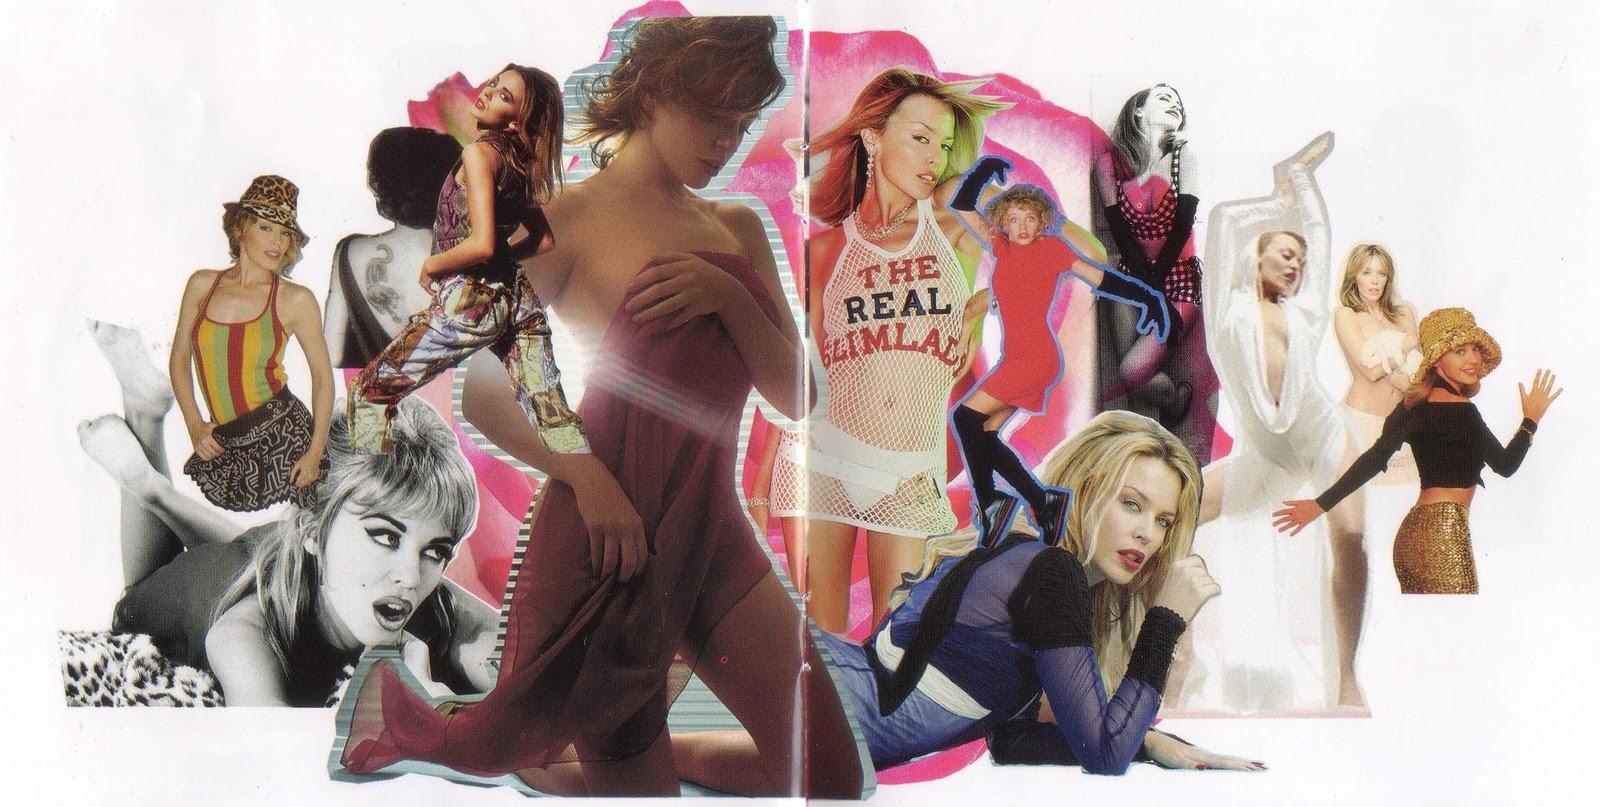 http://2.bp.blogspot.com/-t0bMyNbzkwQ/TZMtbYJIhsI/AAAAAAAACDw/noOnslzXzFE/s1600/Kylie+Minogue+-+Ultimate+Kylie+%2528Booklet%2529+-+CD+%25282-4%2529.jpg